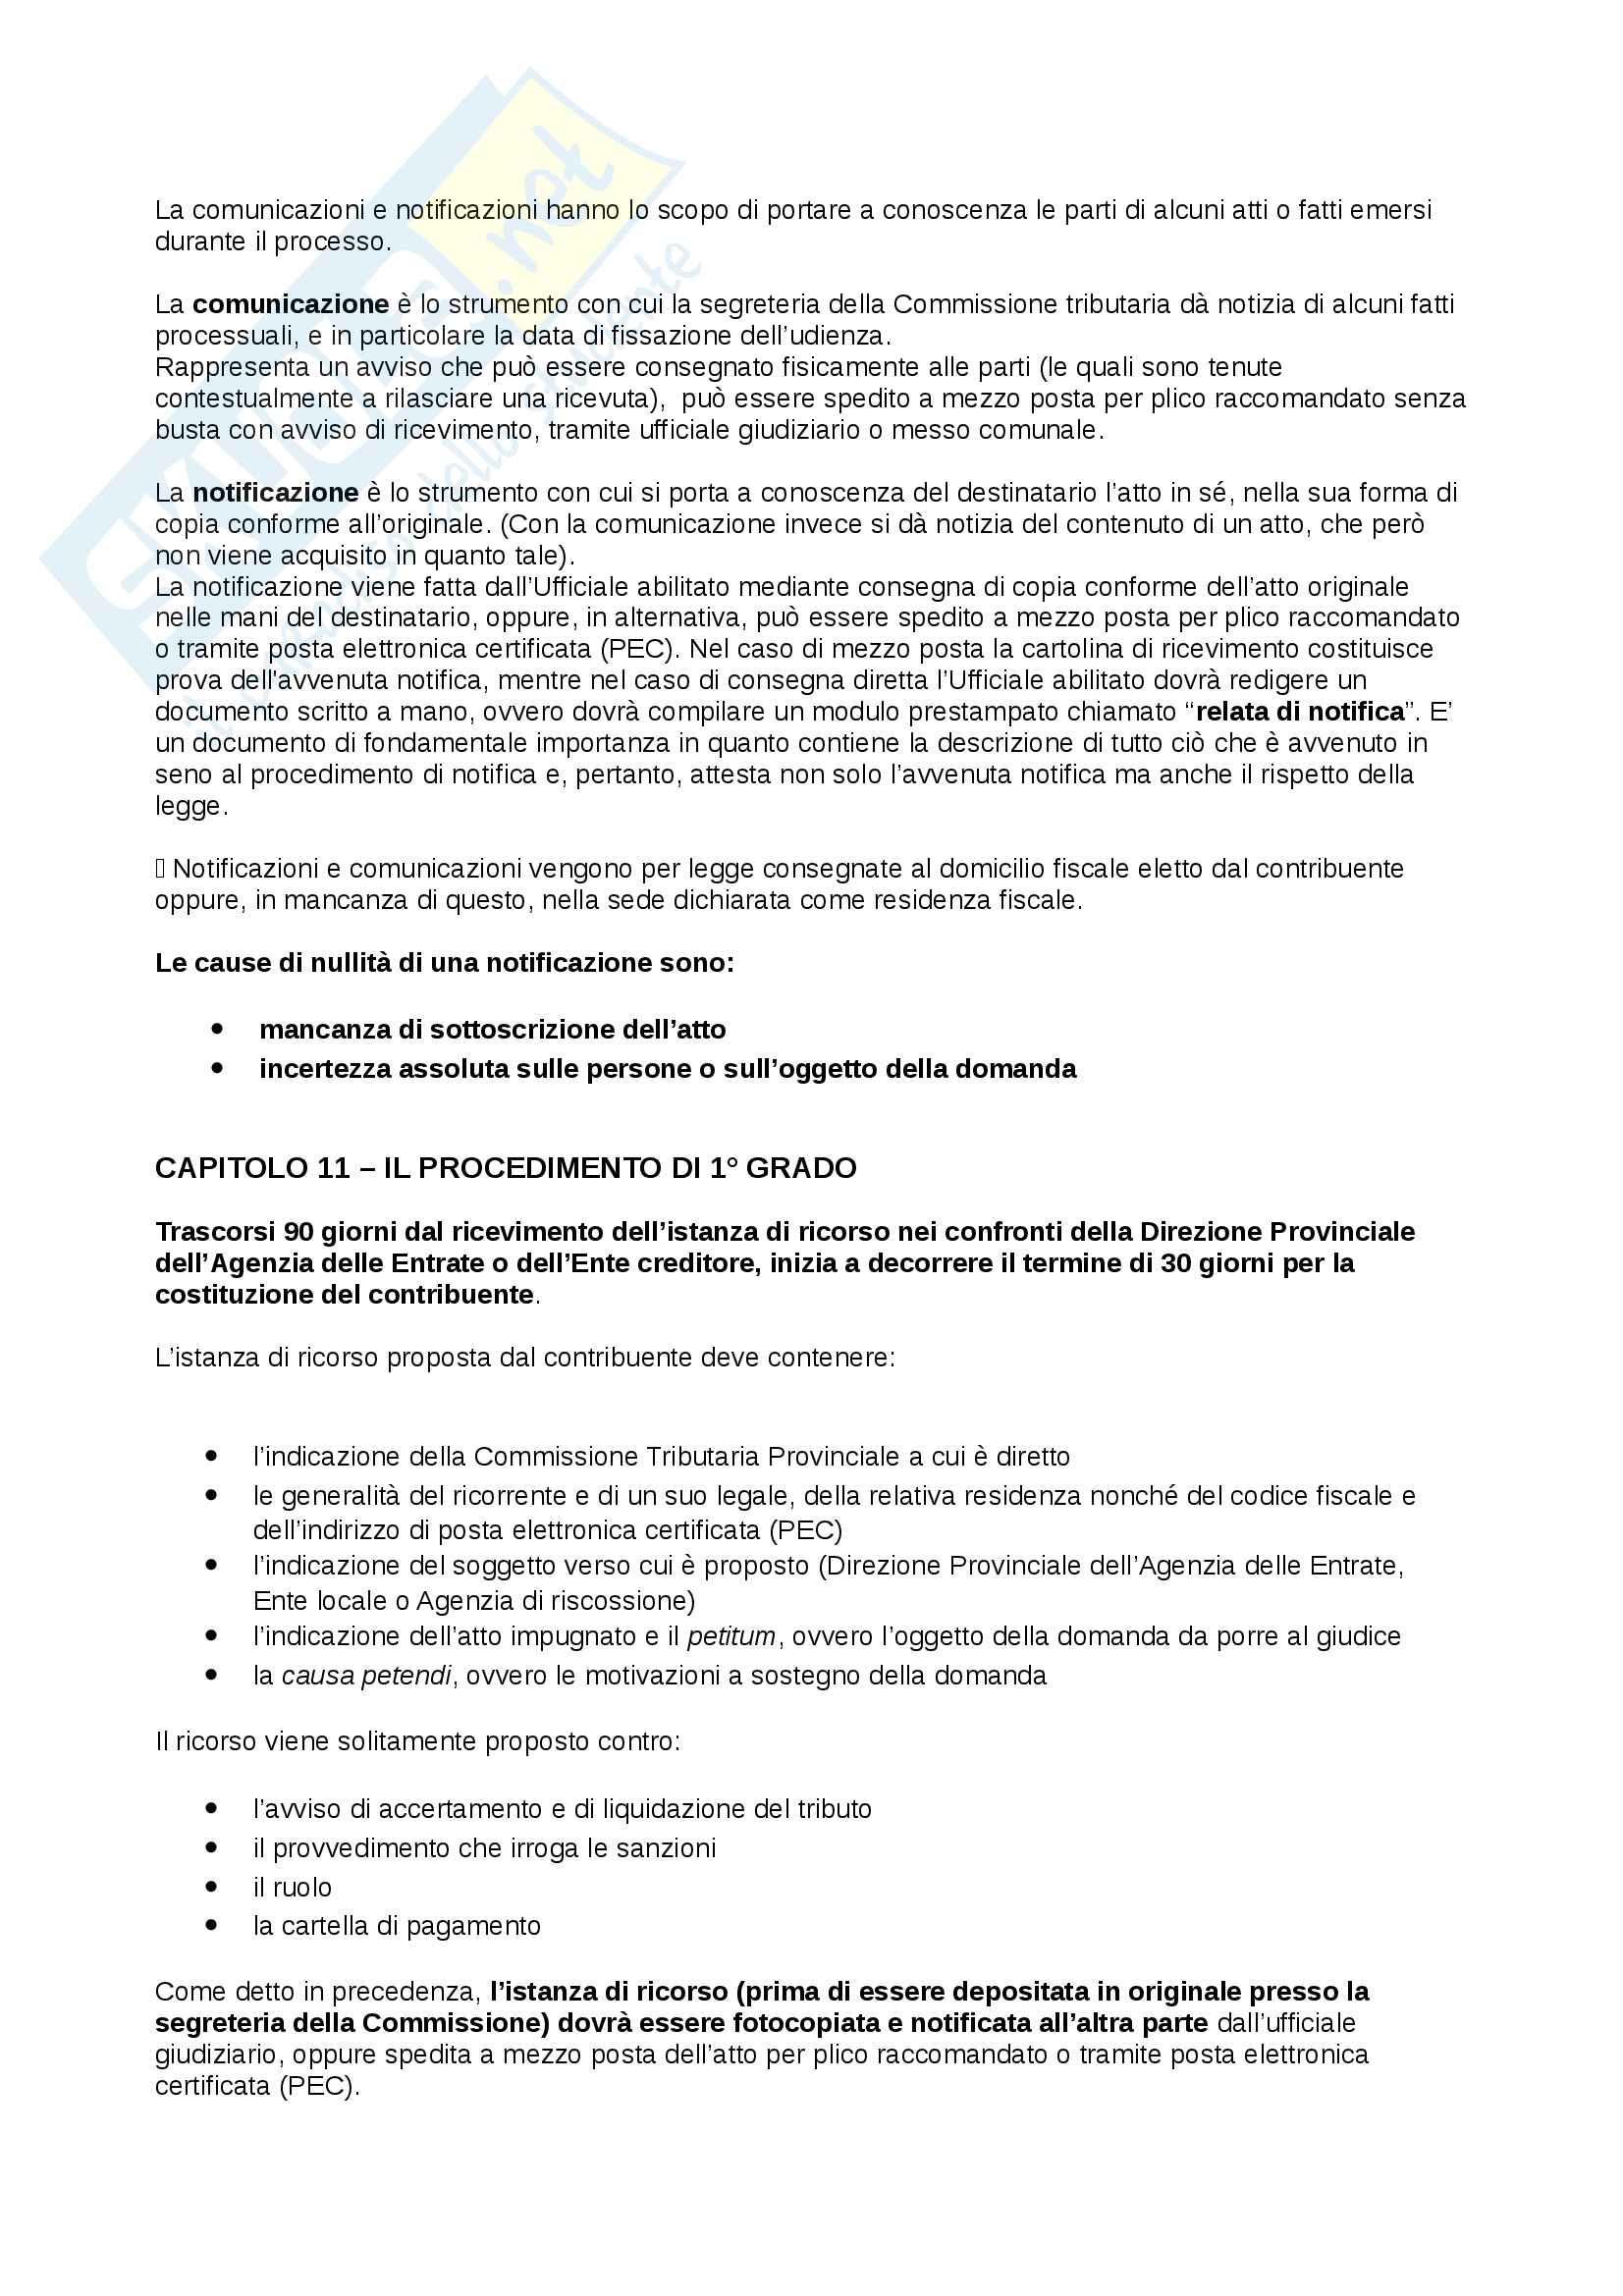 Appunti Diritto tributario d'impresa, prof. Giorgi Pag. 46